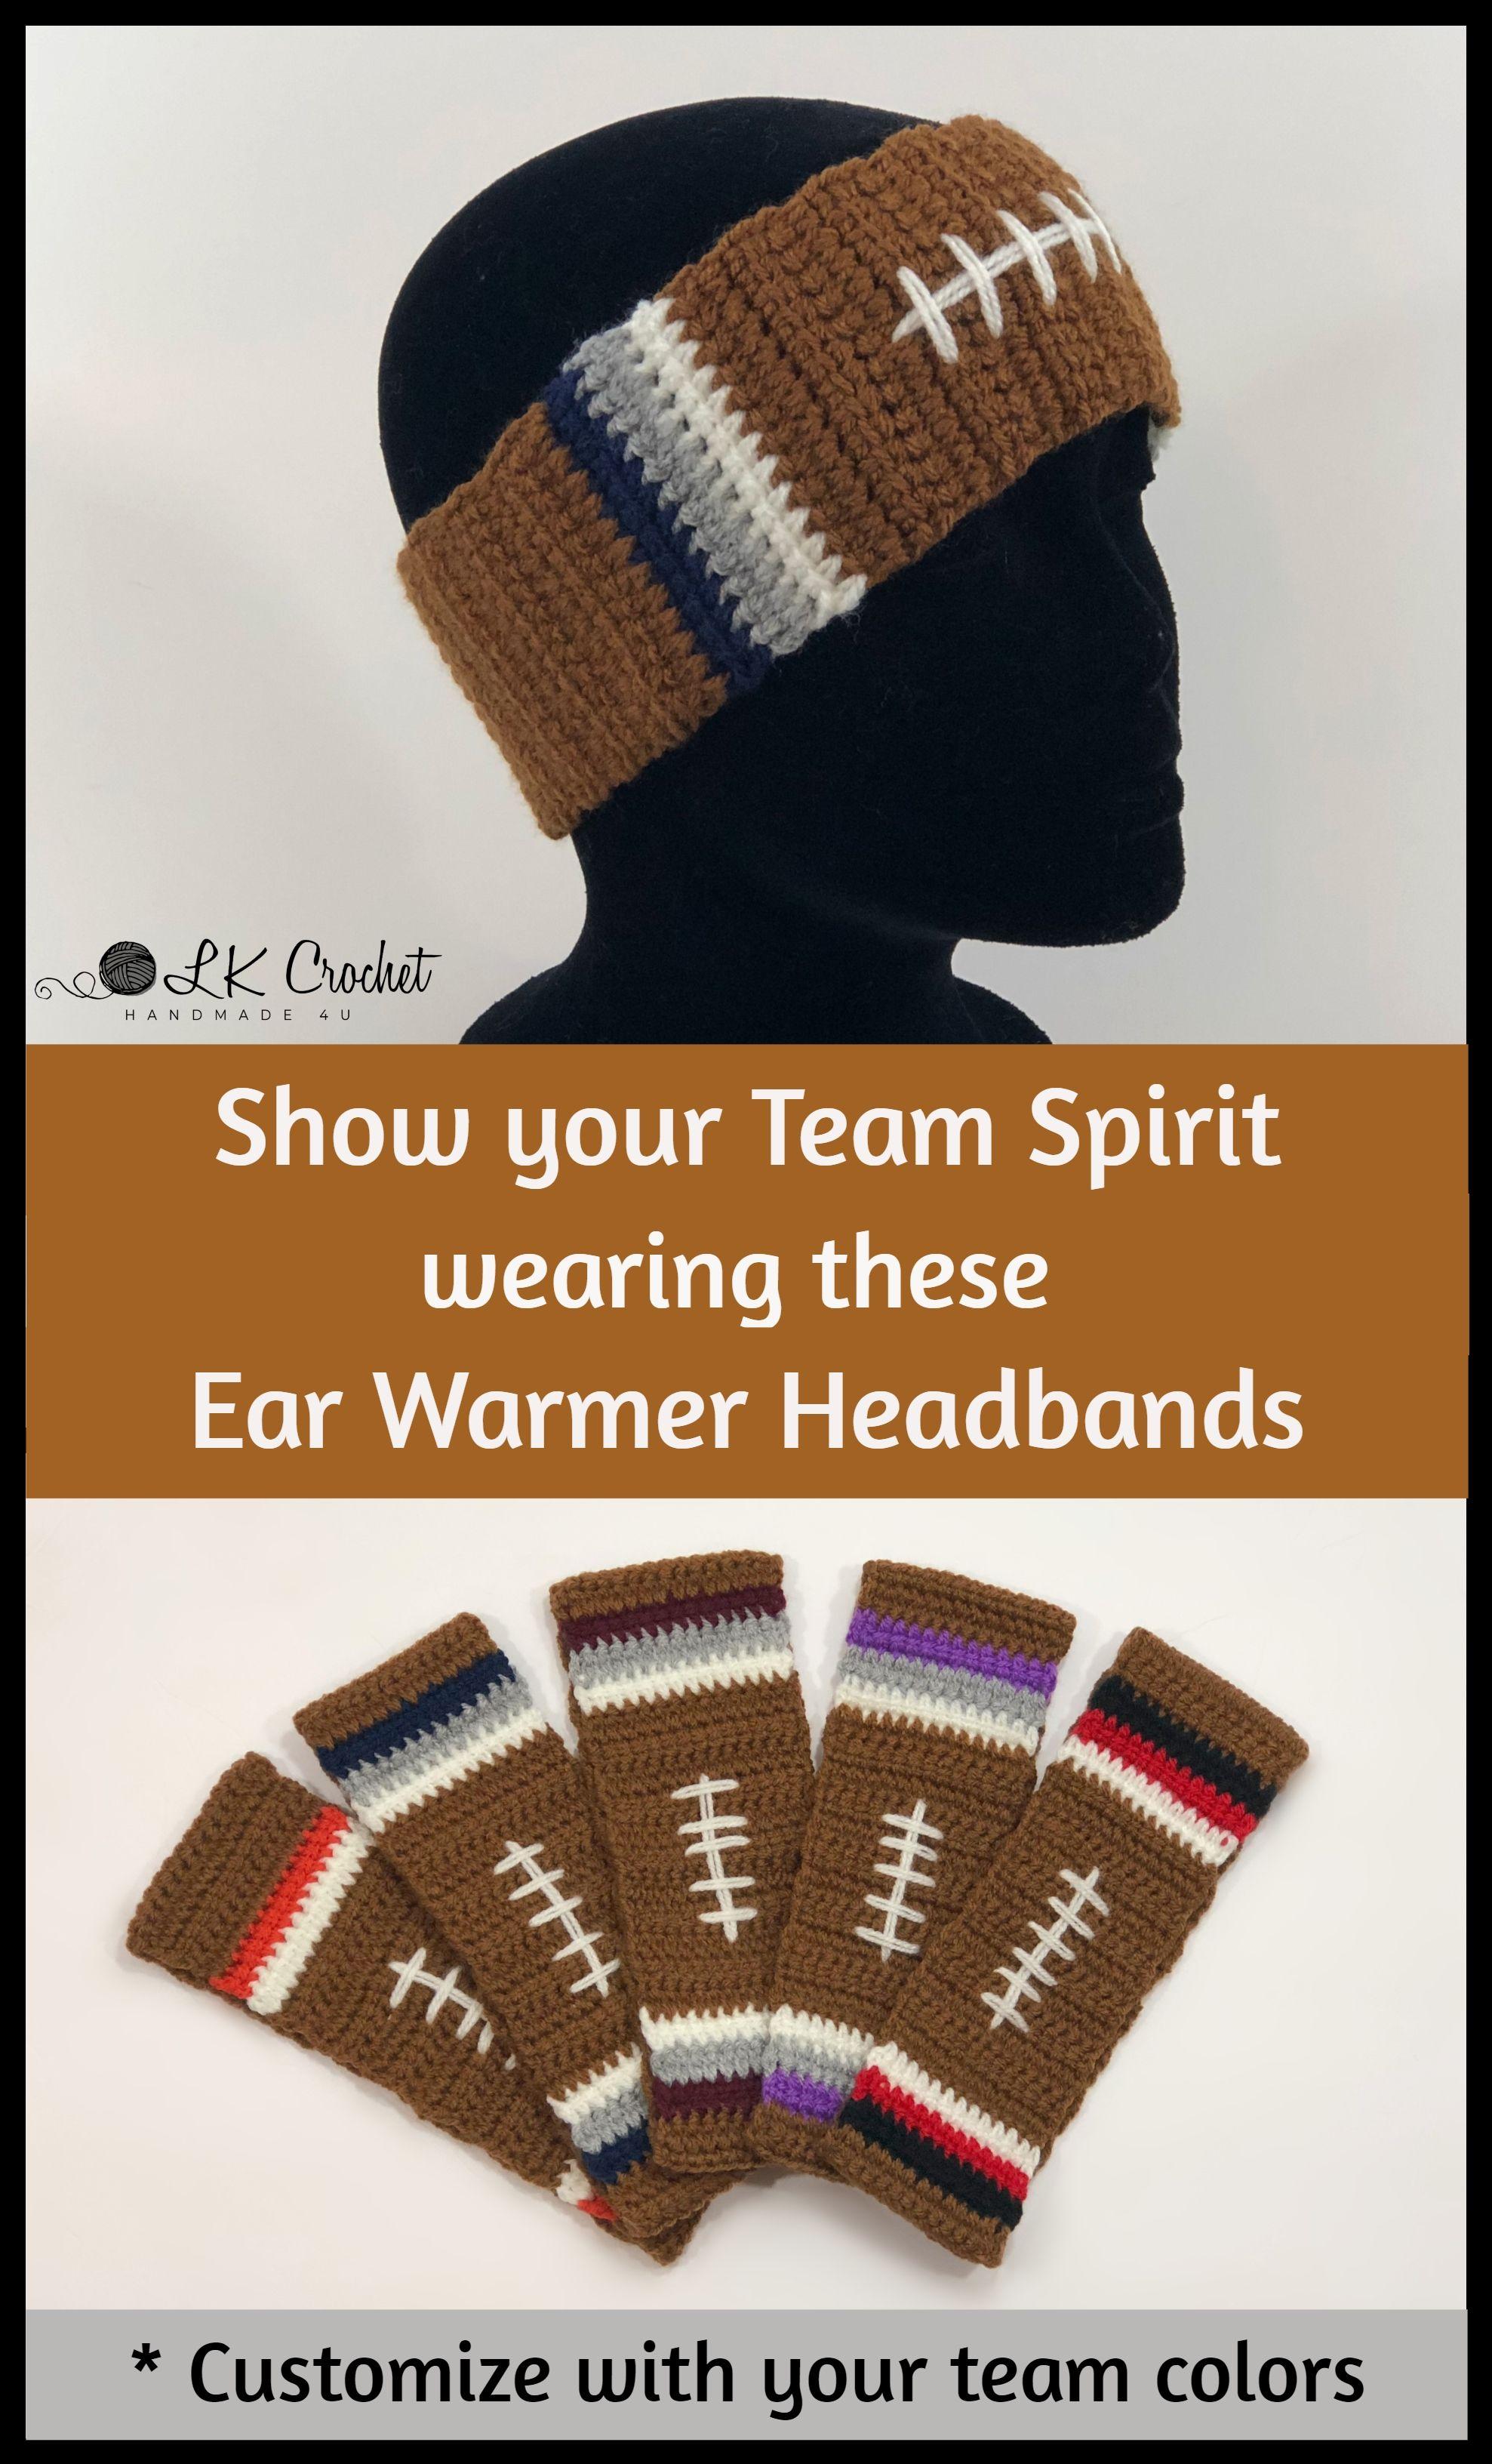 Crocheted Football Team Ear Warmer Headbands  8a4dc875d